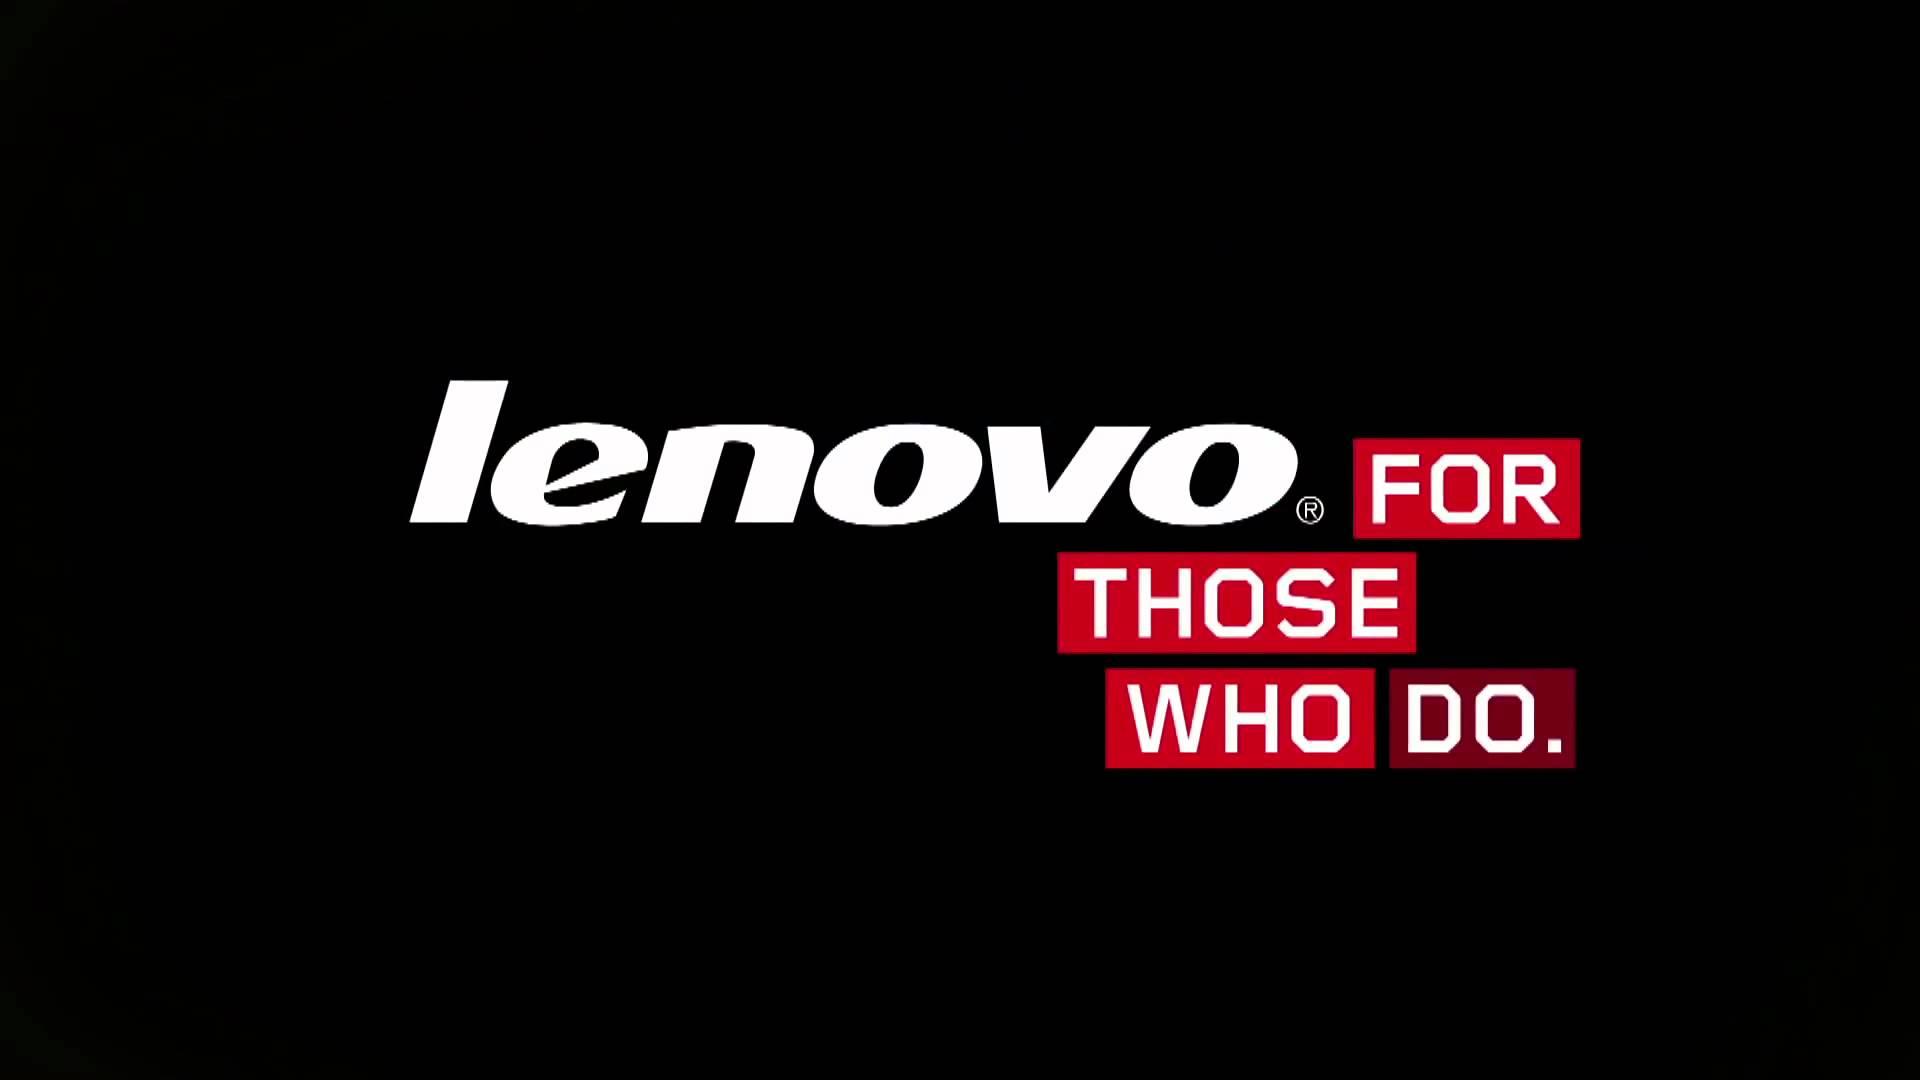 Lenovo เลอโนโวจัดโปรฯ ท้าฟินทุกที่ เซลฟี่โดนใจ